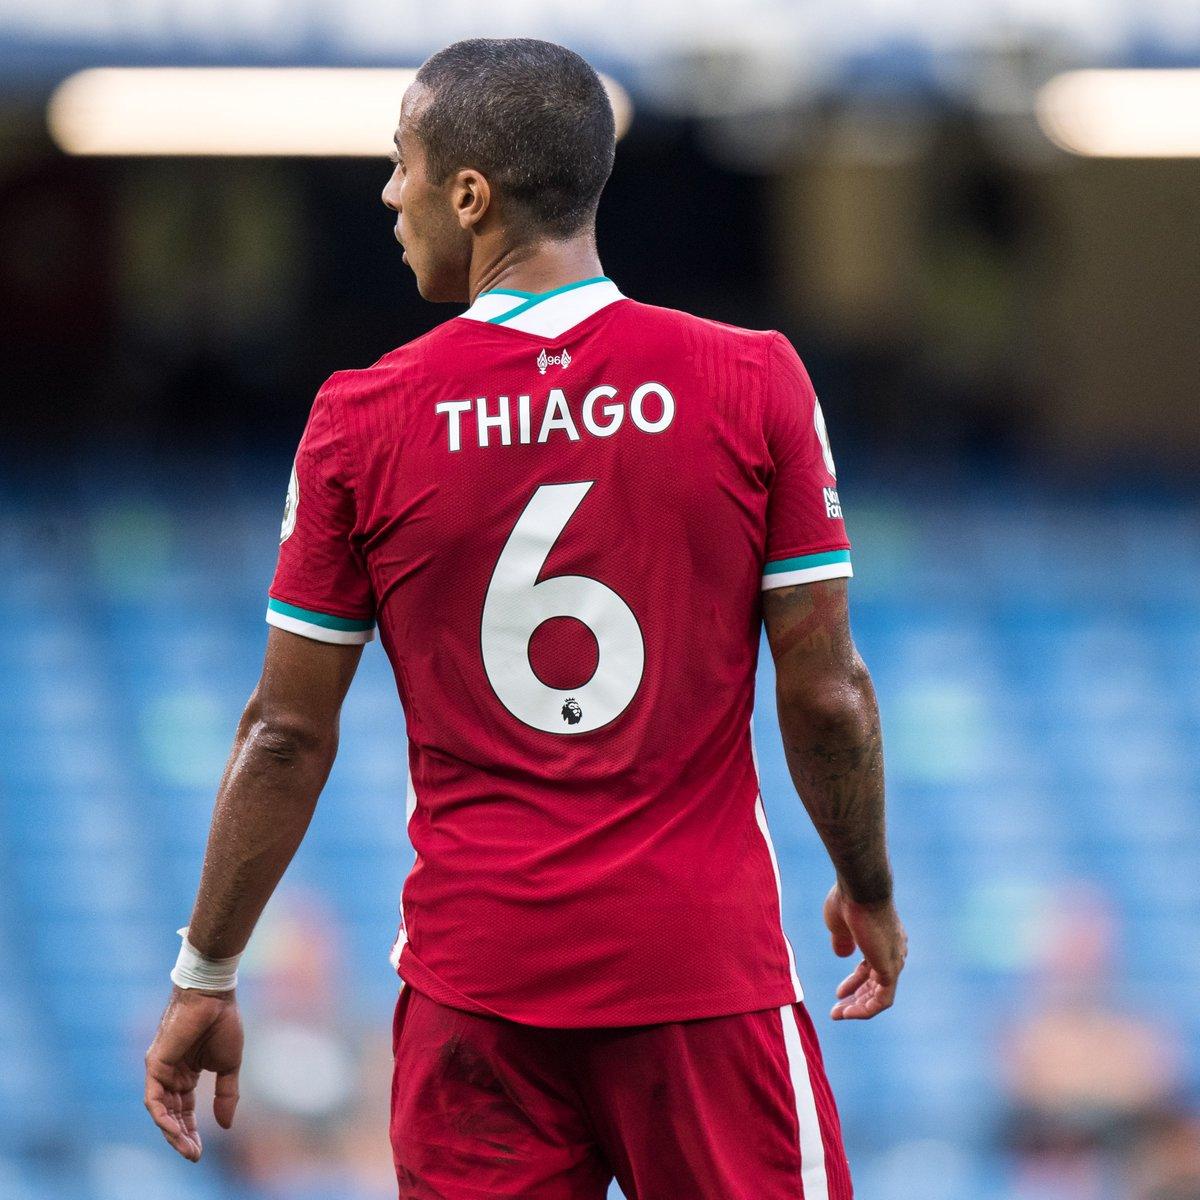 🔴 New baller in town! Thiago Alcántara at Liverpool...  #UCL https://t.co/Z1aCzEkzZk